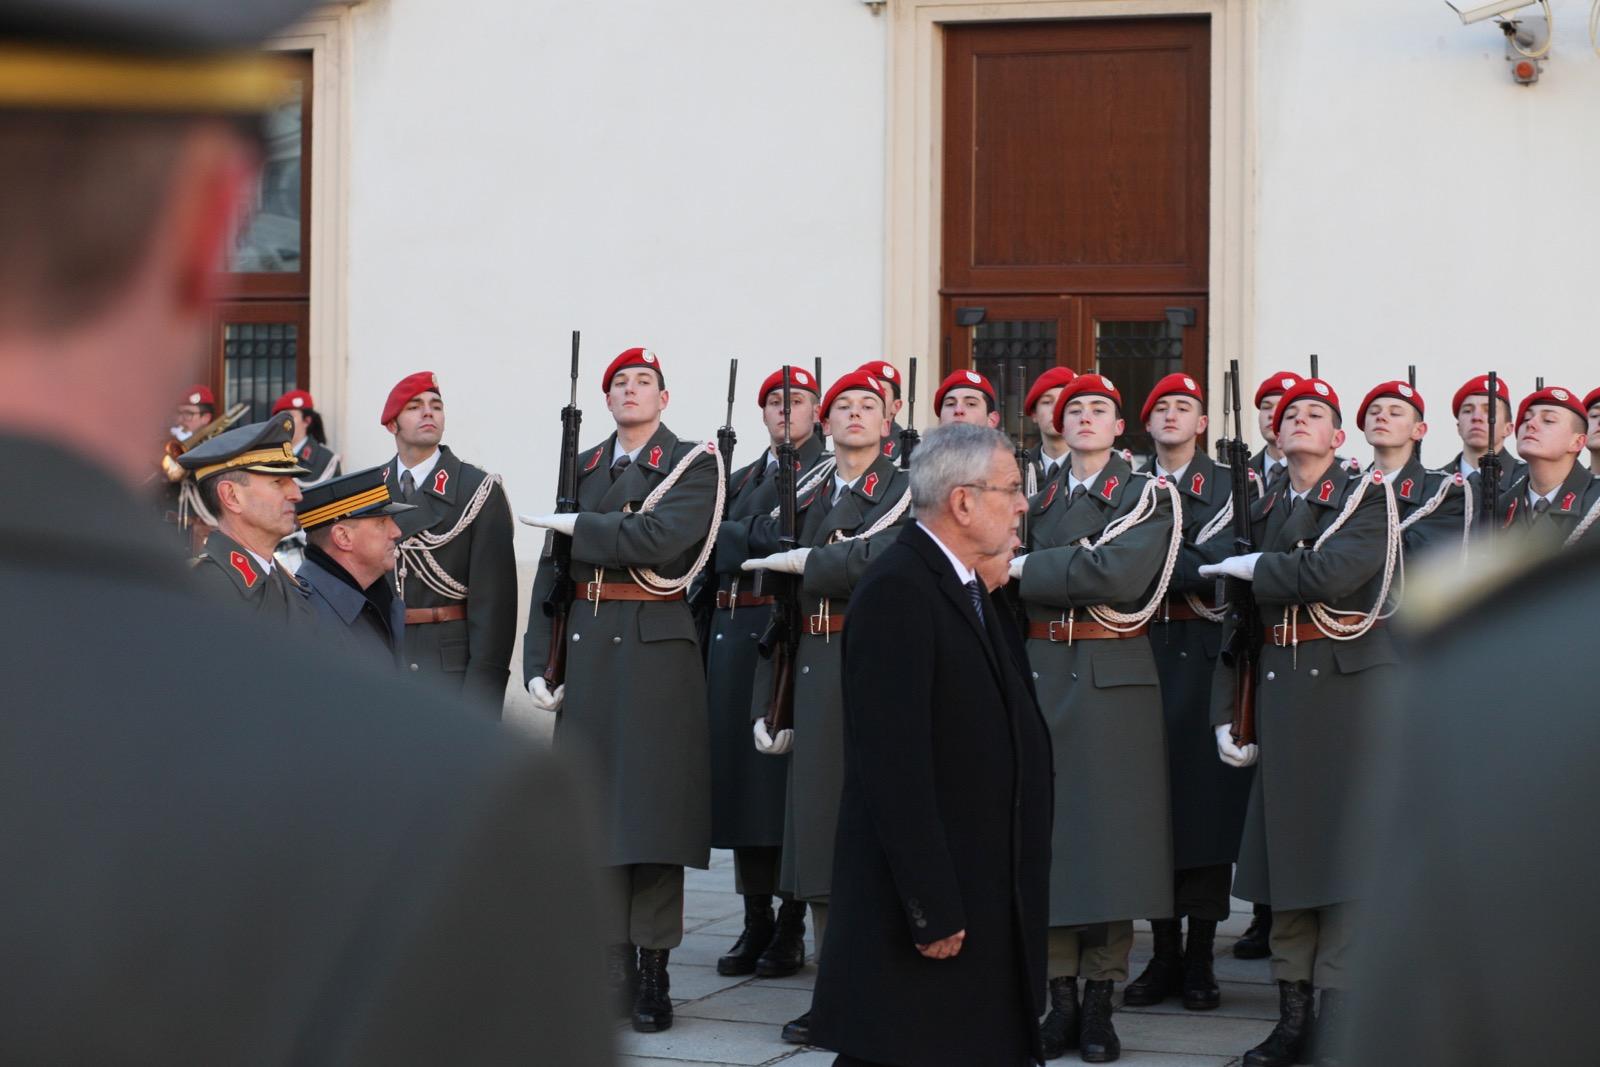 2019_01_11_1Gardekompanie_HBP_SUI_Präsident_Schweiz_Burghof - 25 of 36